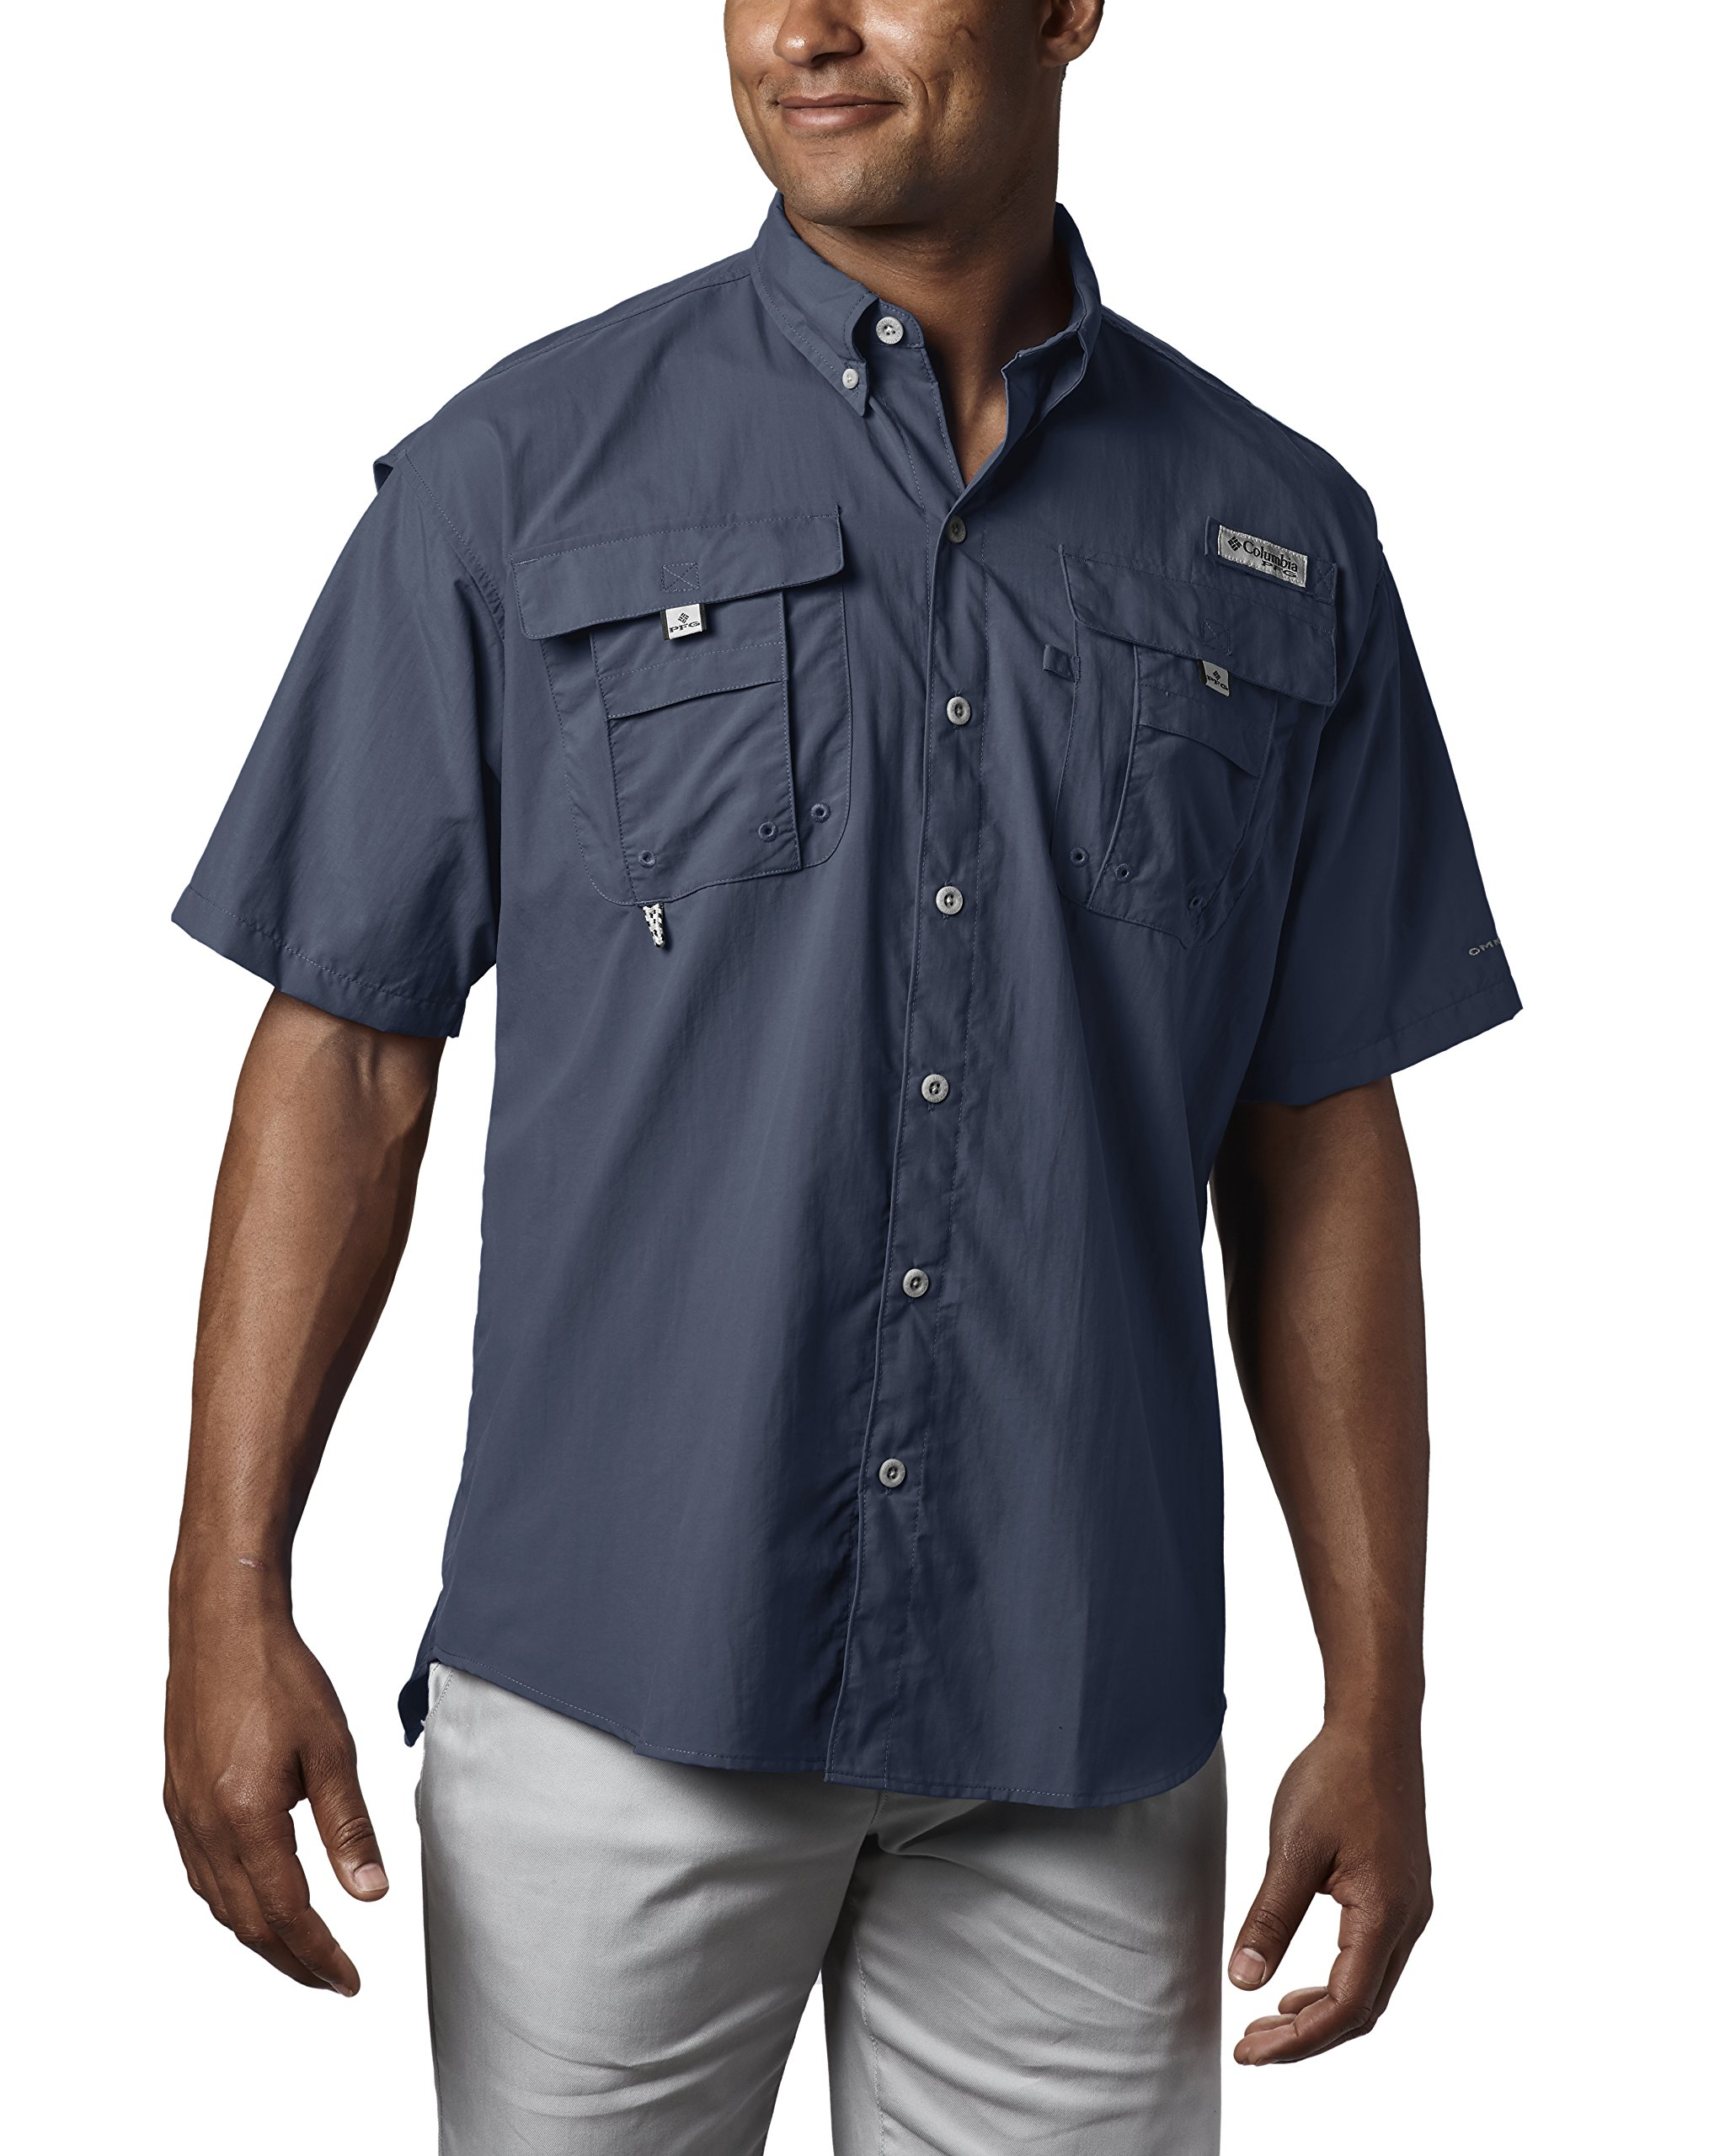 Columbia Men's PFG Bahama II Short Sleeve Shirt, Collegiate Navy, X-Small